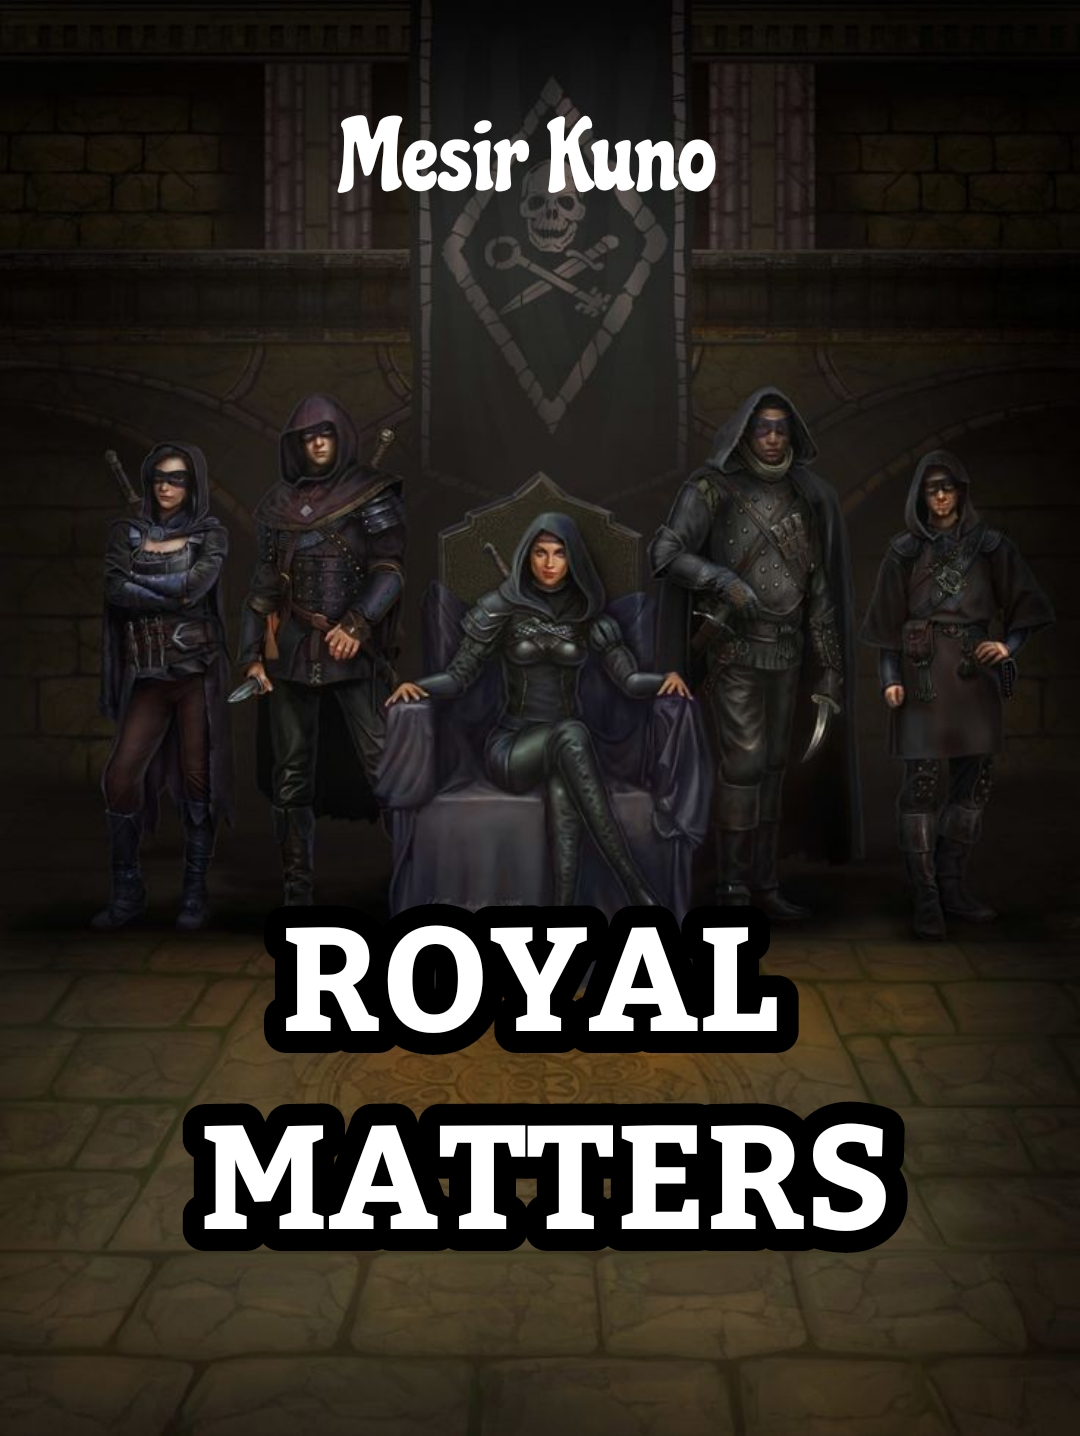 Royal Matters